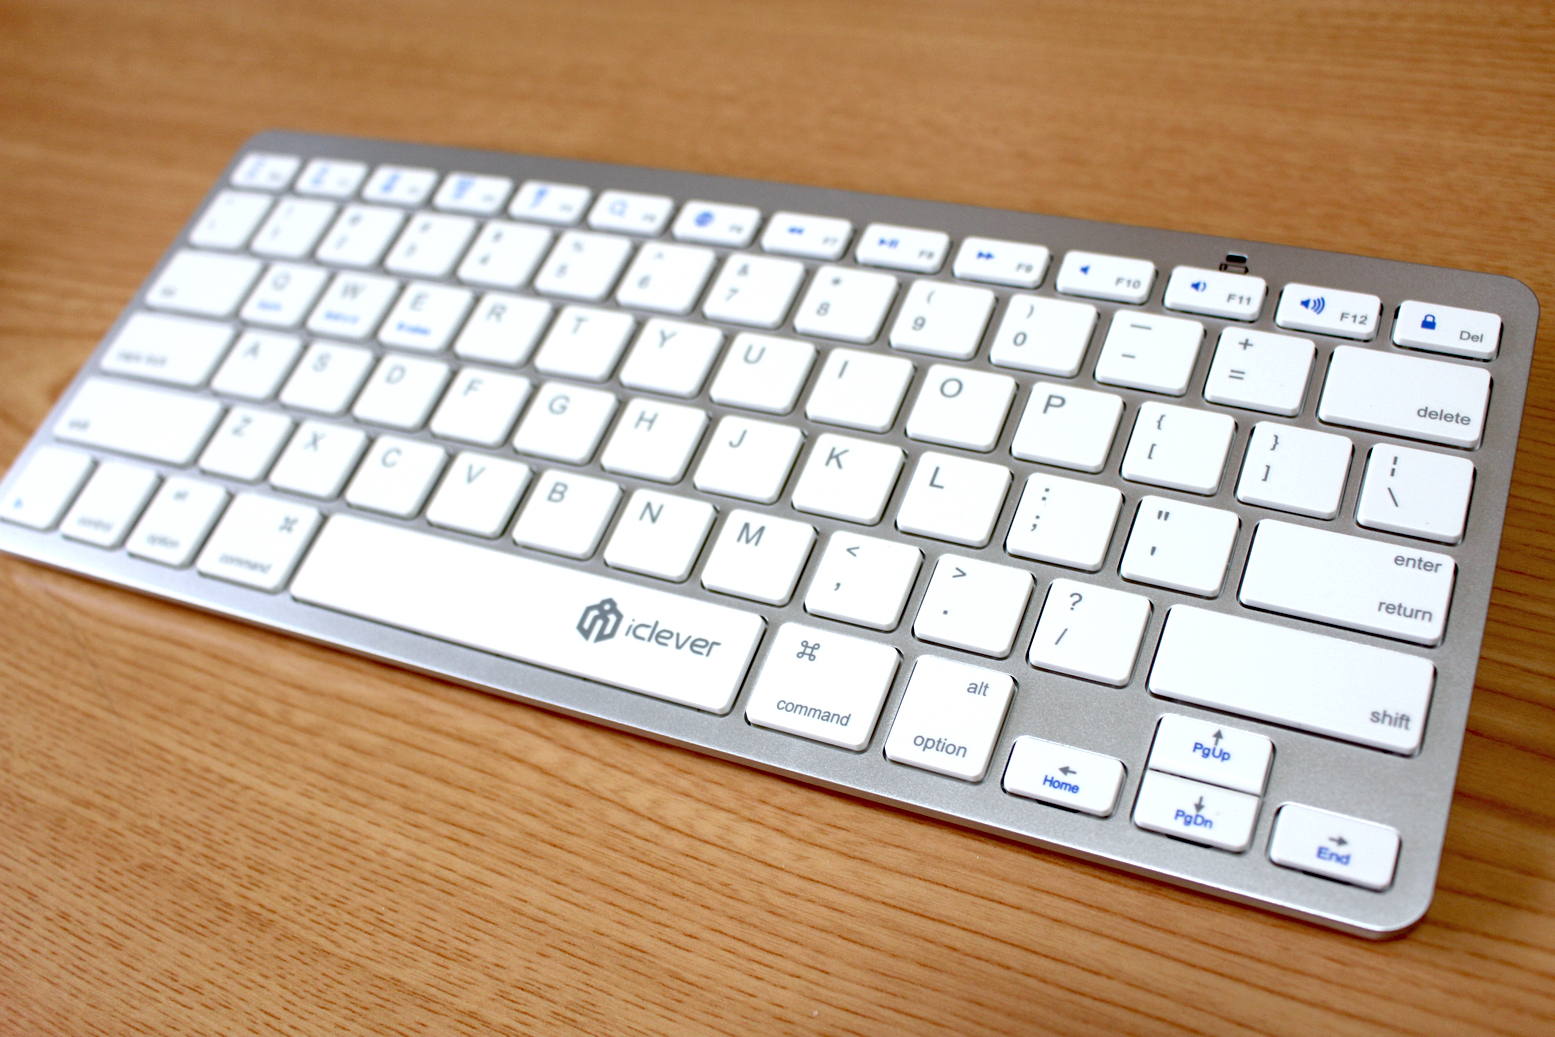 『iClever 3-in-1 ウルトラスリム・ミニBluetoothワイヤレスキーボード』レビュー